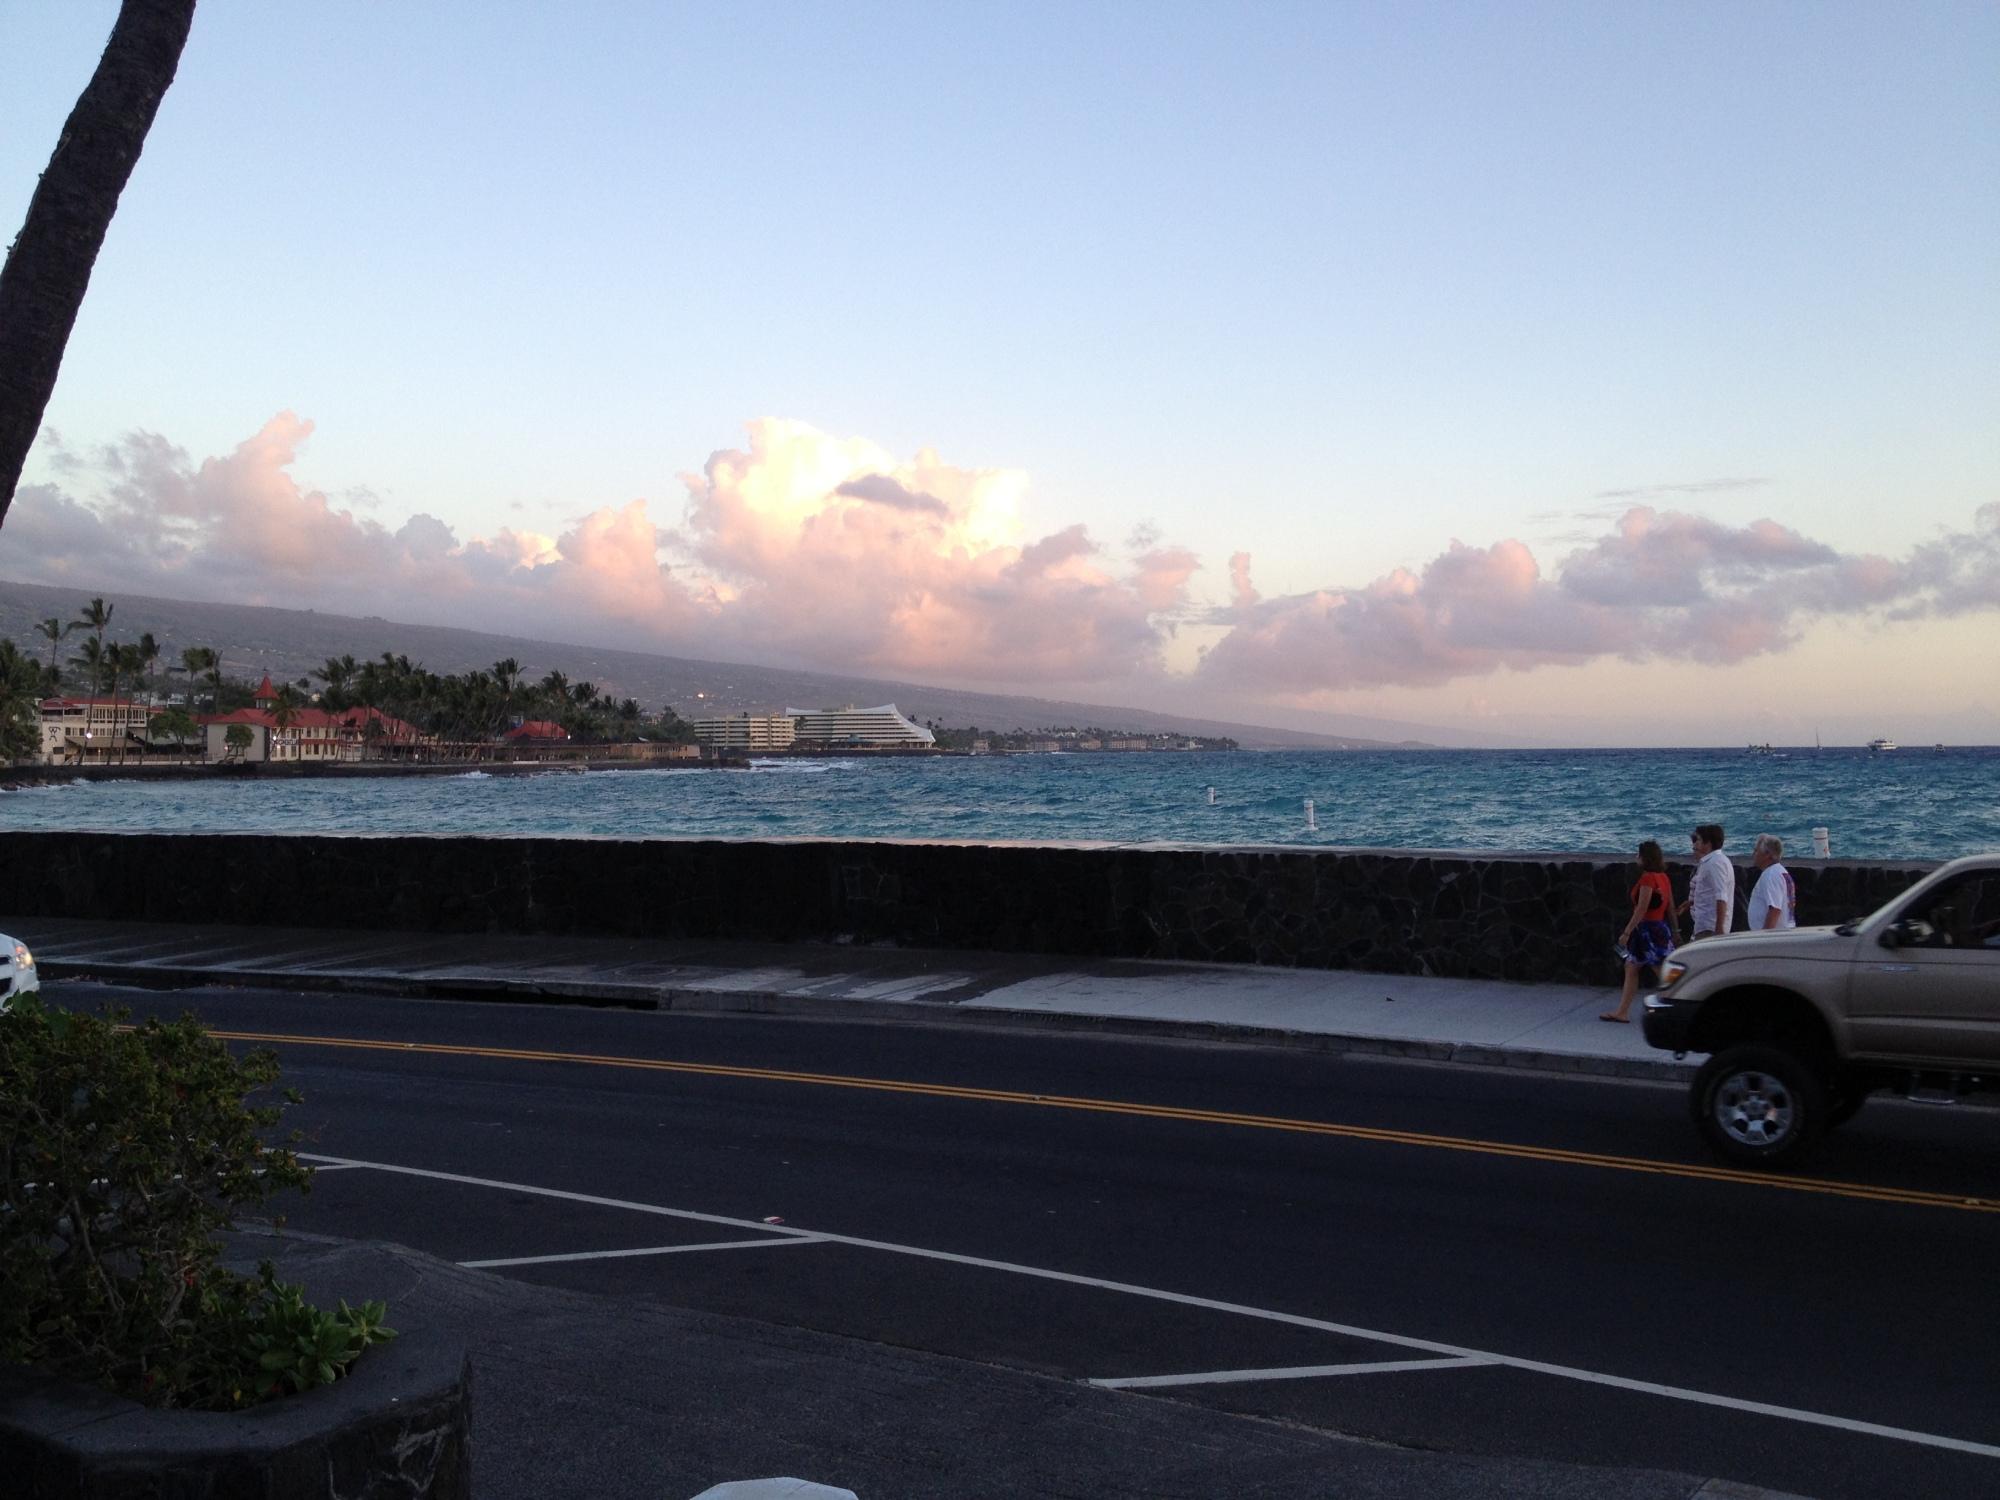 Kona Hawaii, Kailua Bay